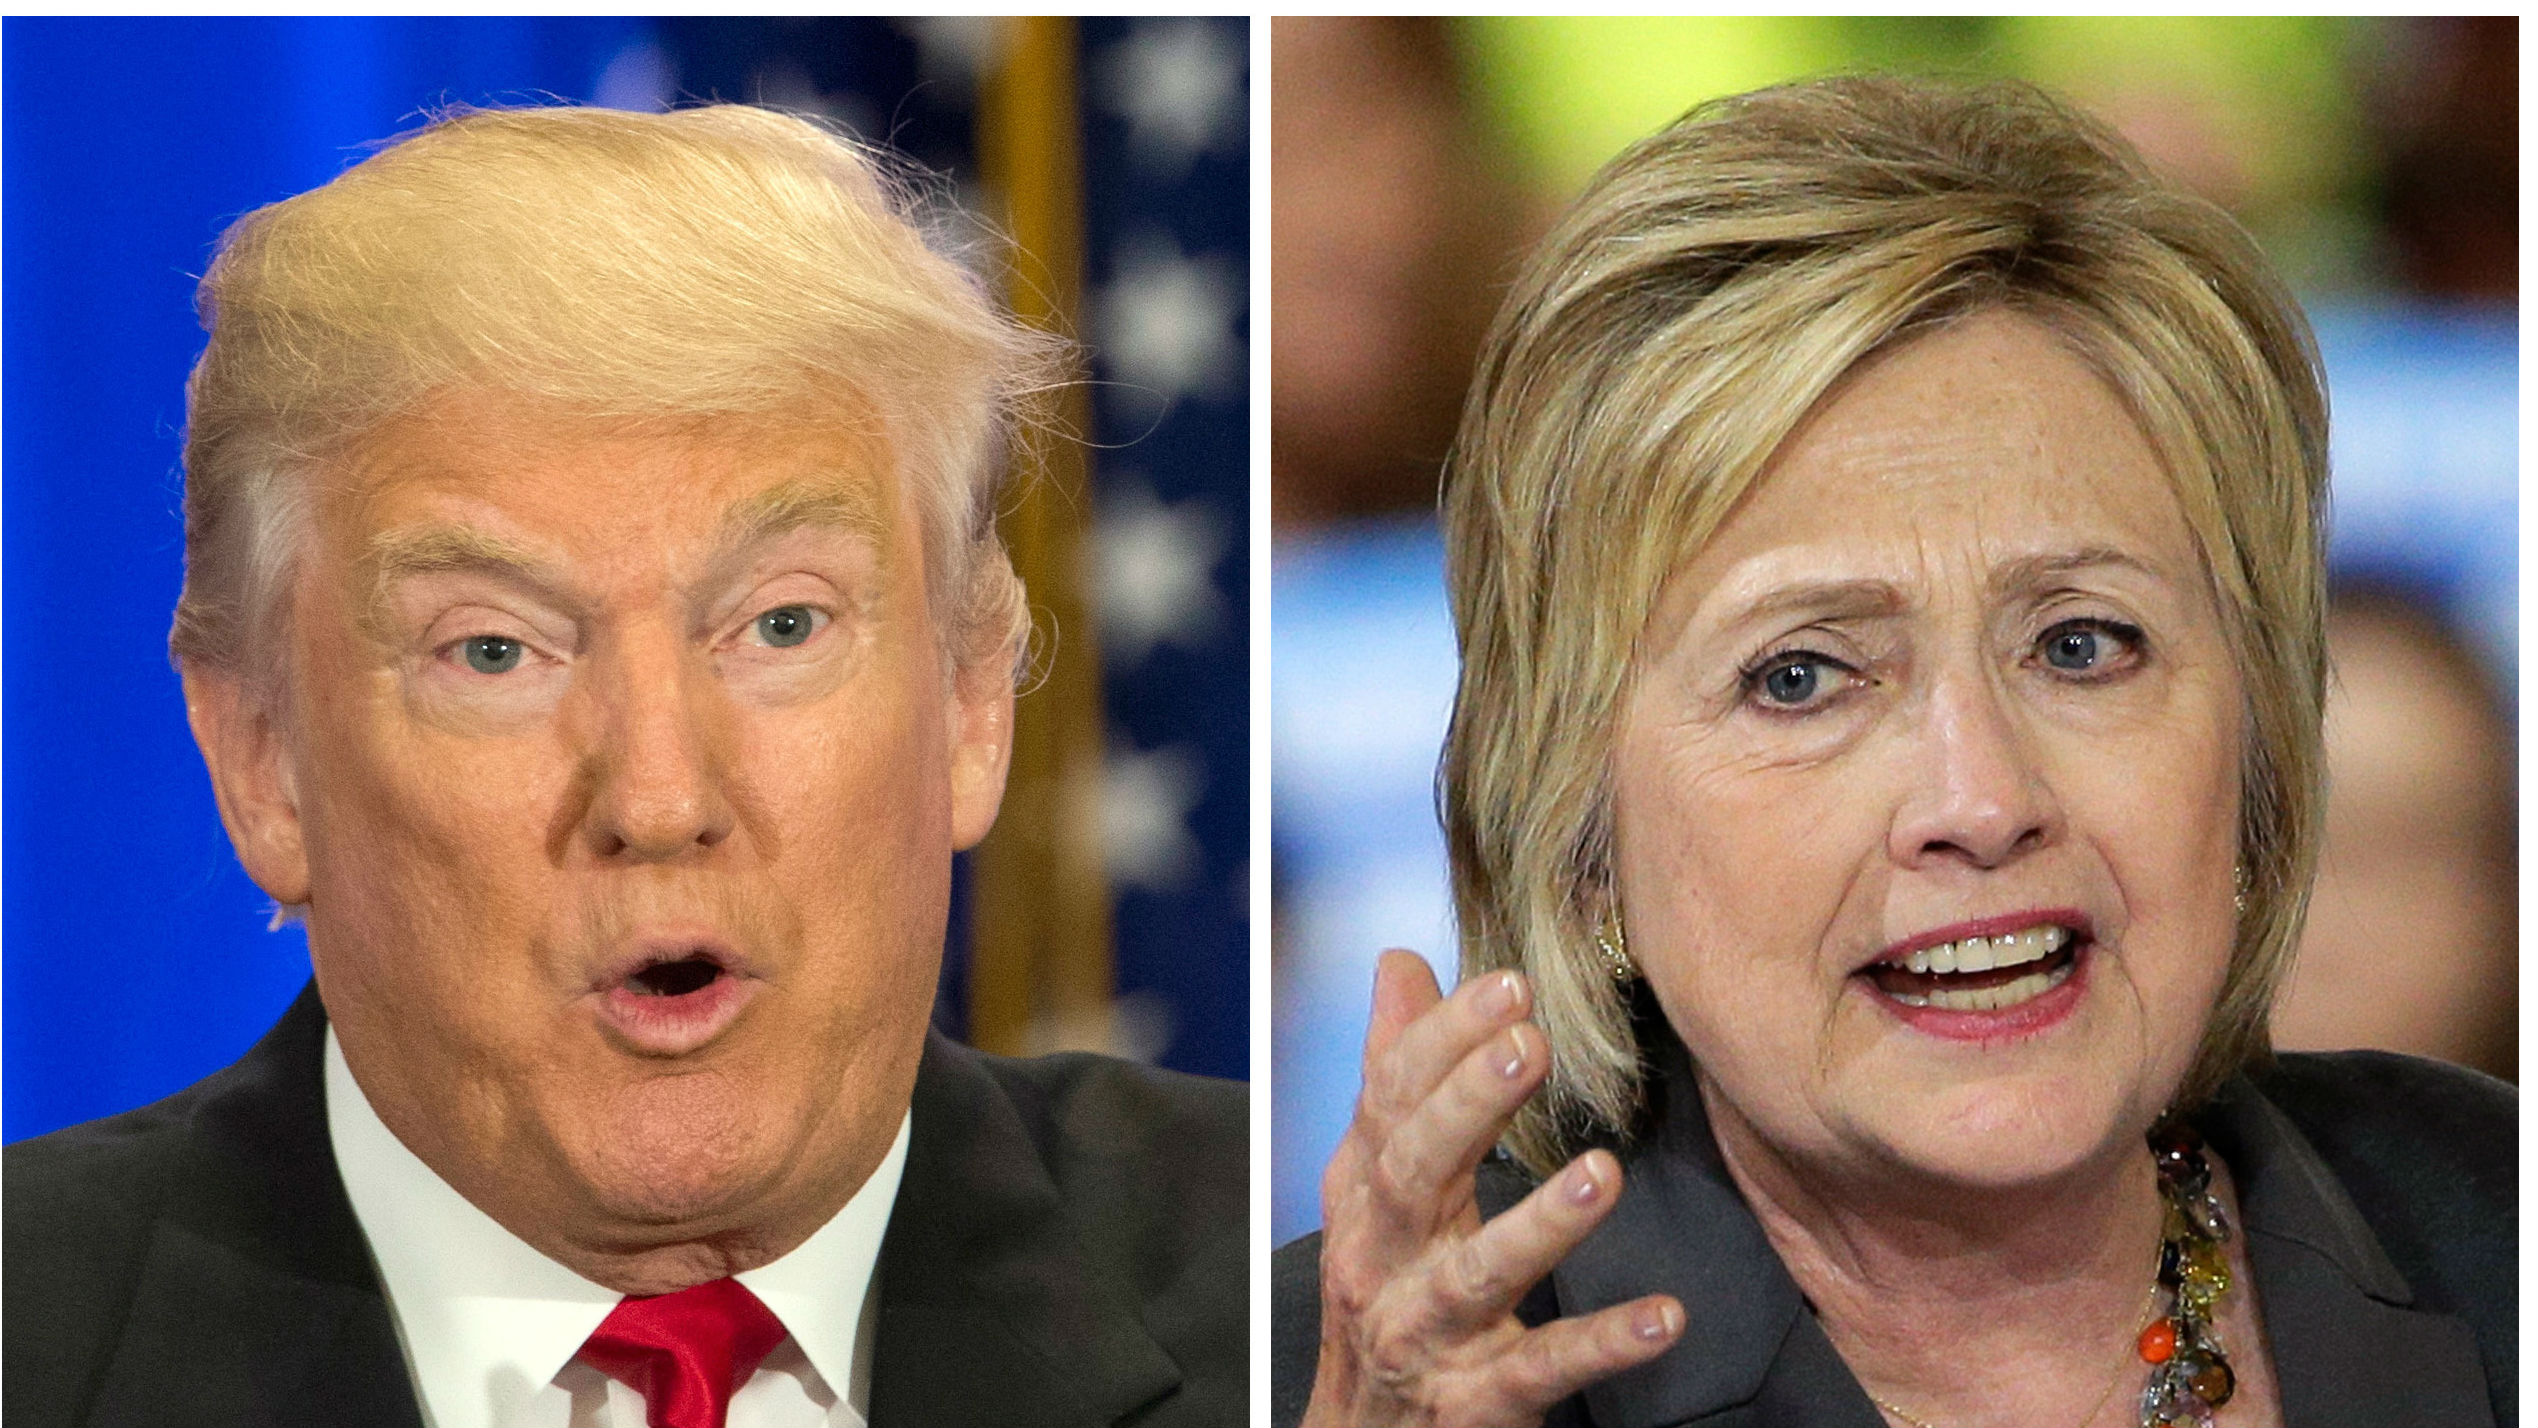 Donald Trump and Hillary Clinton debate